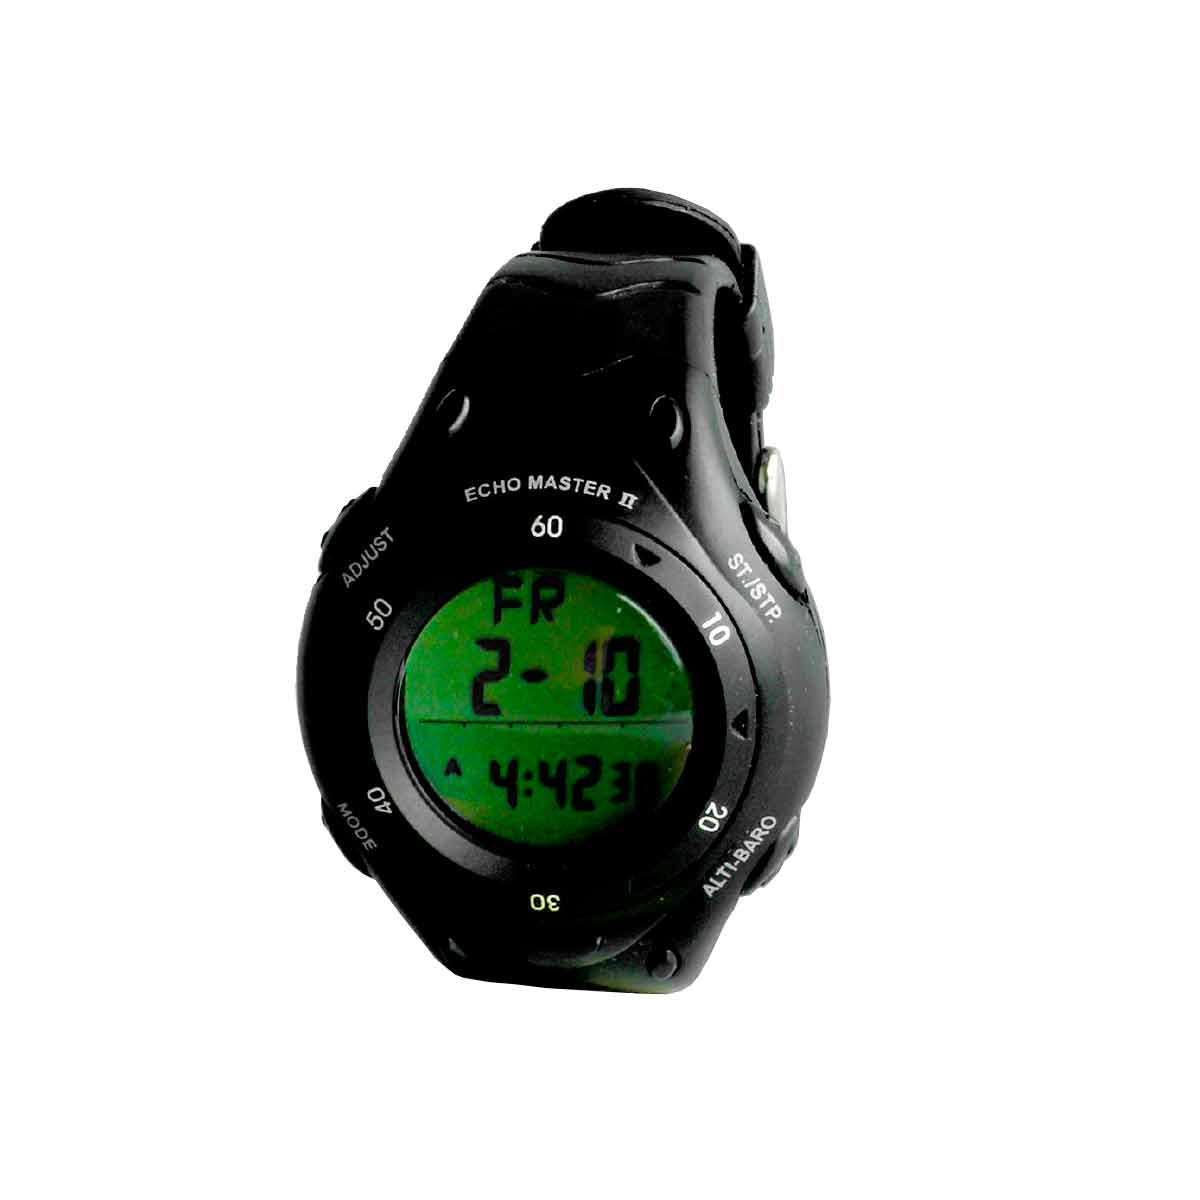 Relógio Digital com Altímetro e Barômetro Echomaster II EMIIW 18 - CSR